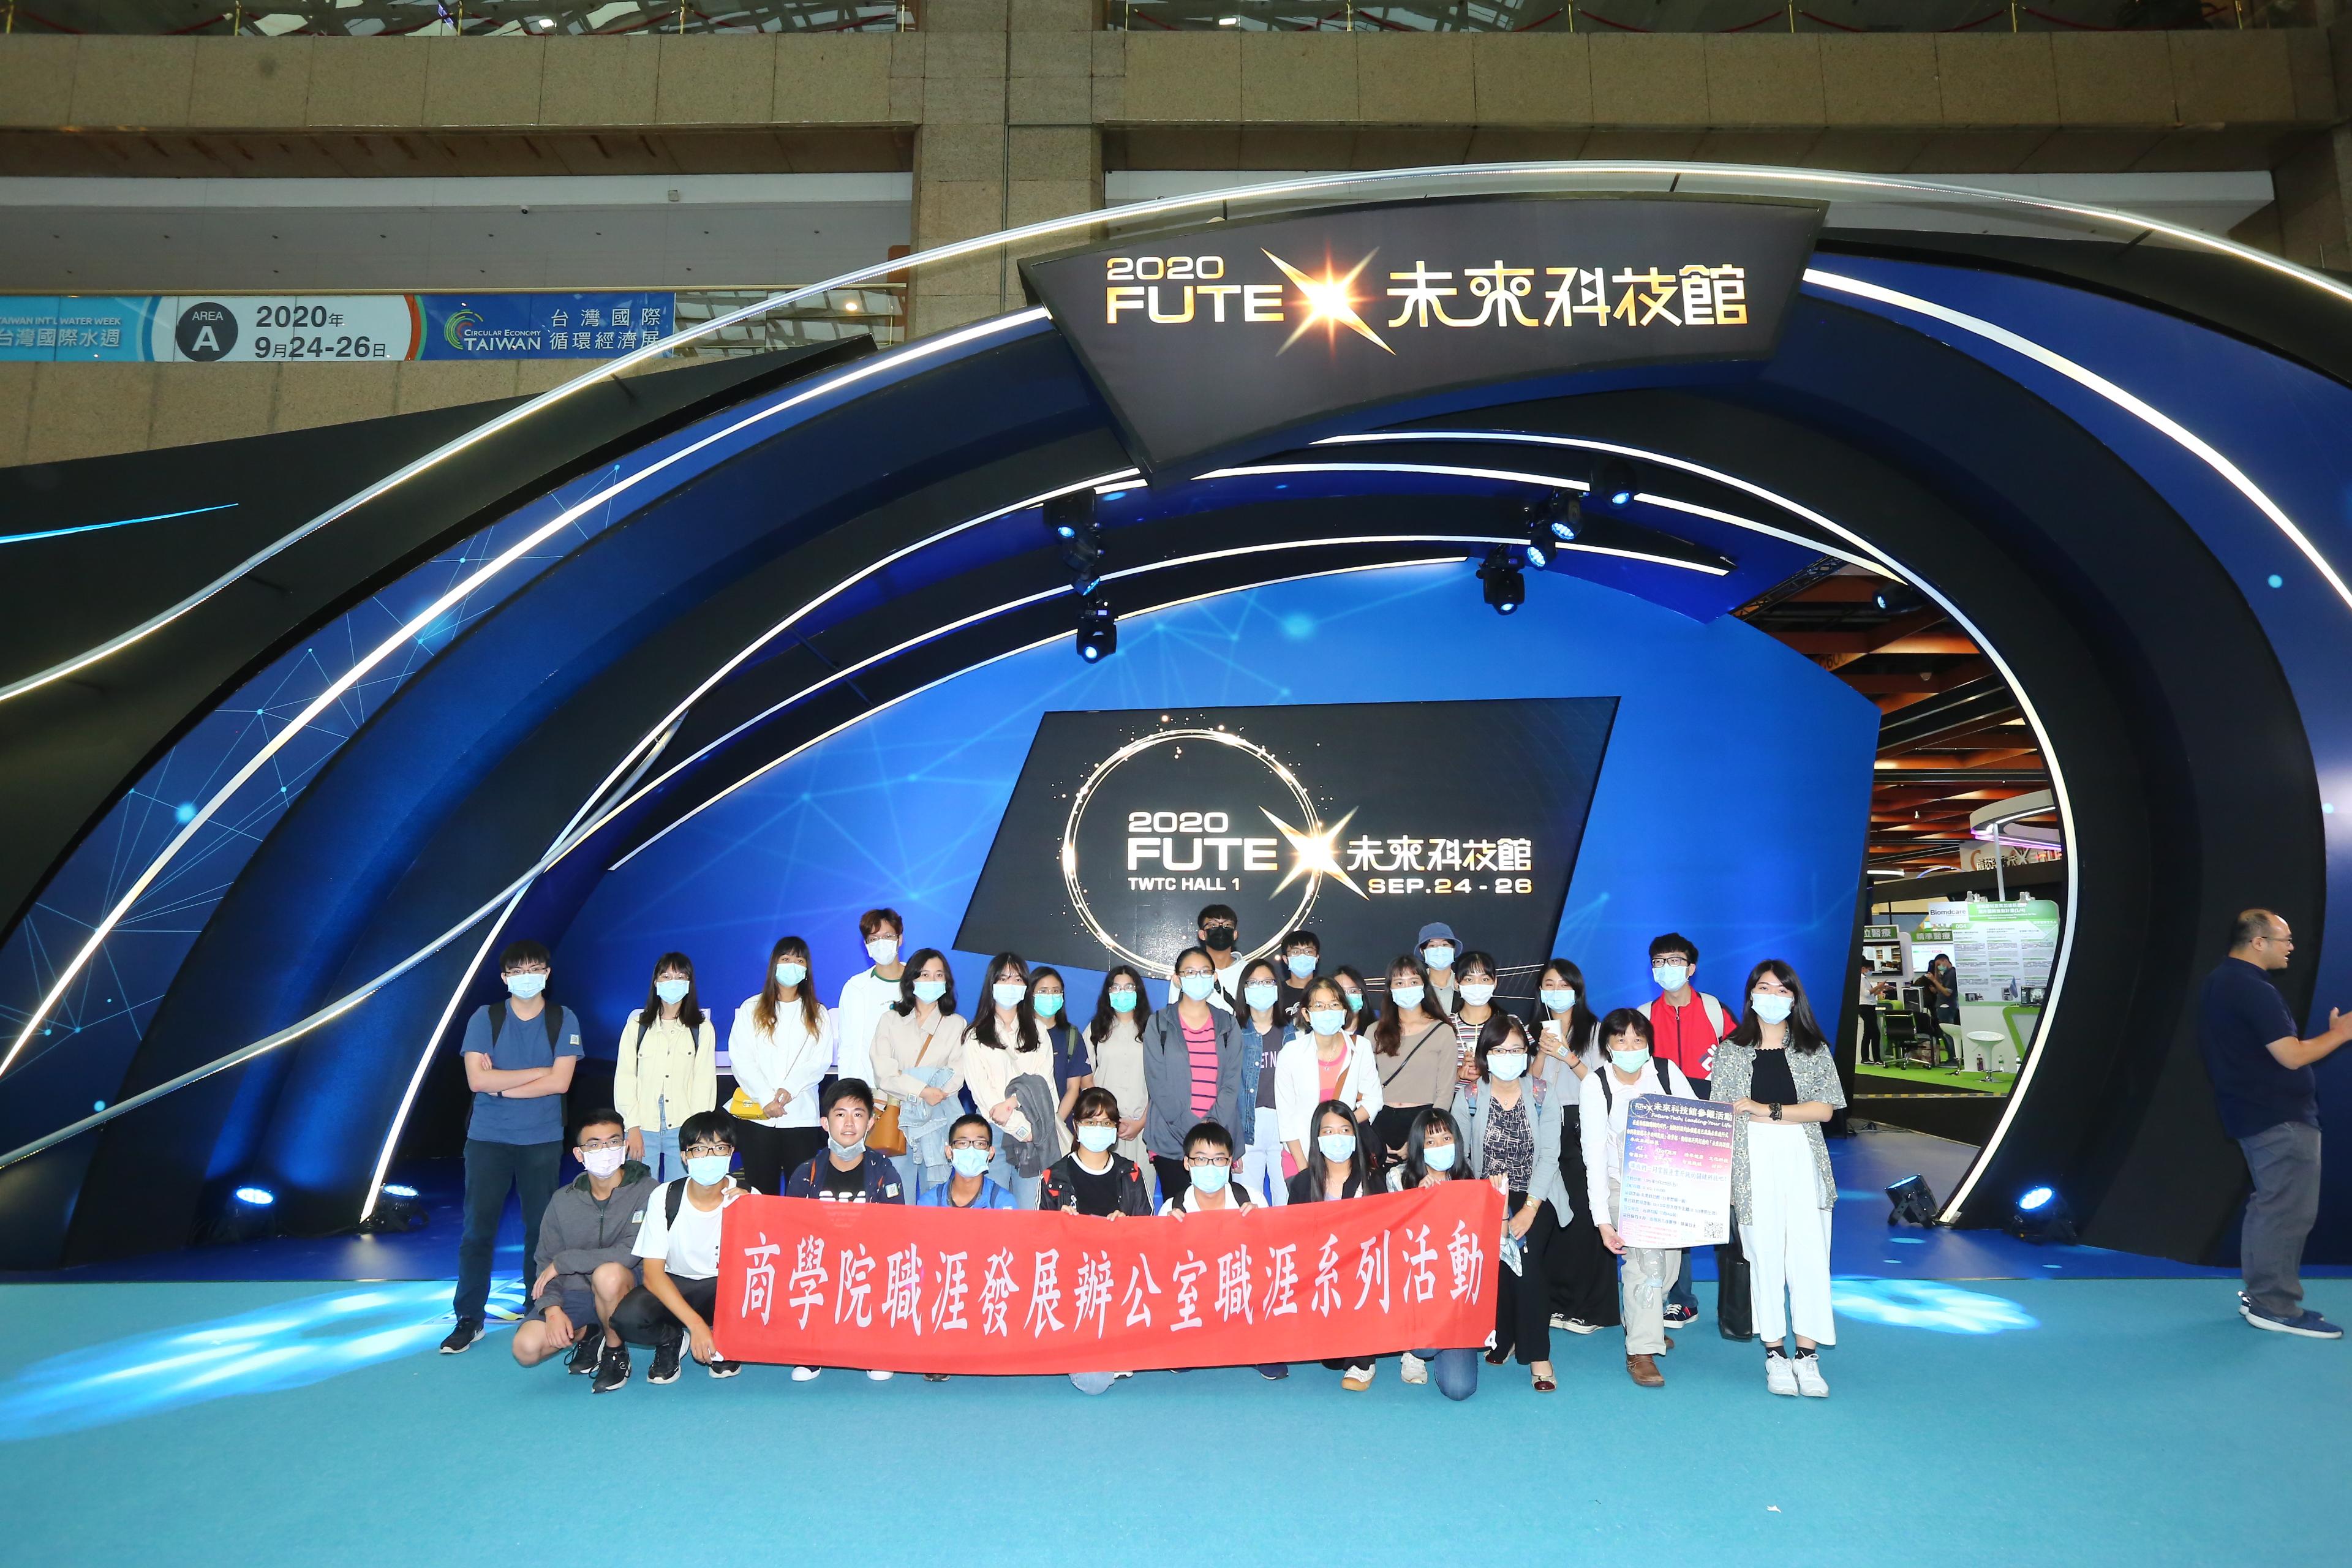 https://storage.googleapis.com/www.taiwantradeshow.com.tw/activity-photo/202009/T-27732891-name.jpg